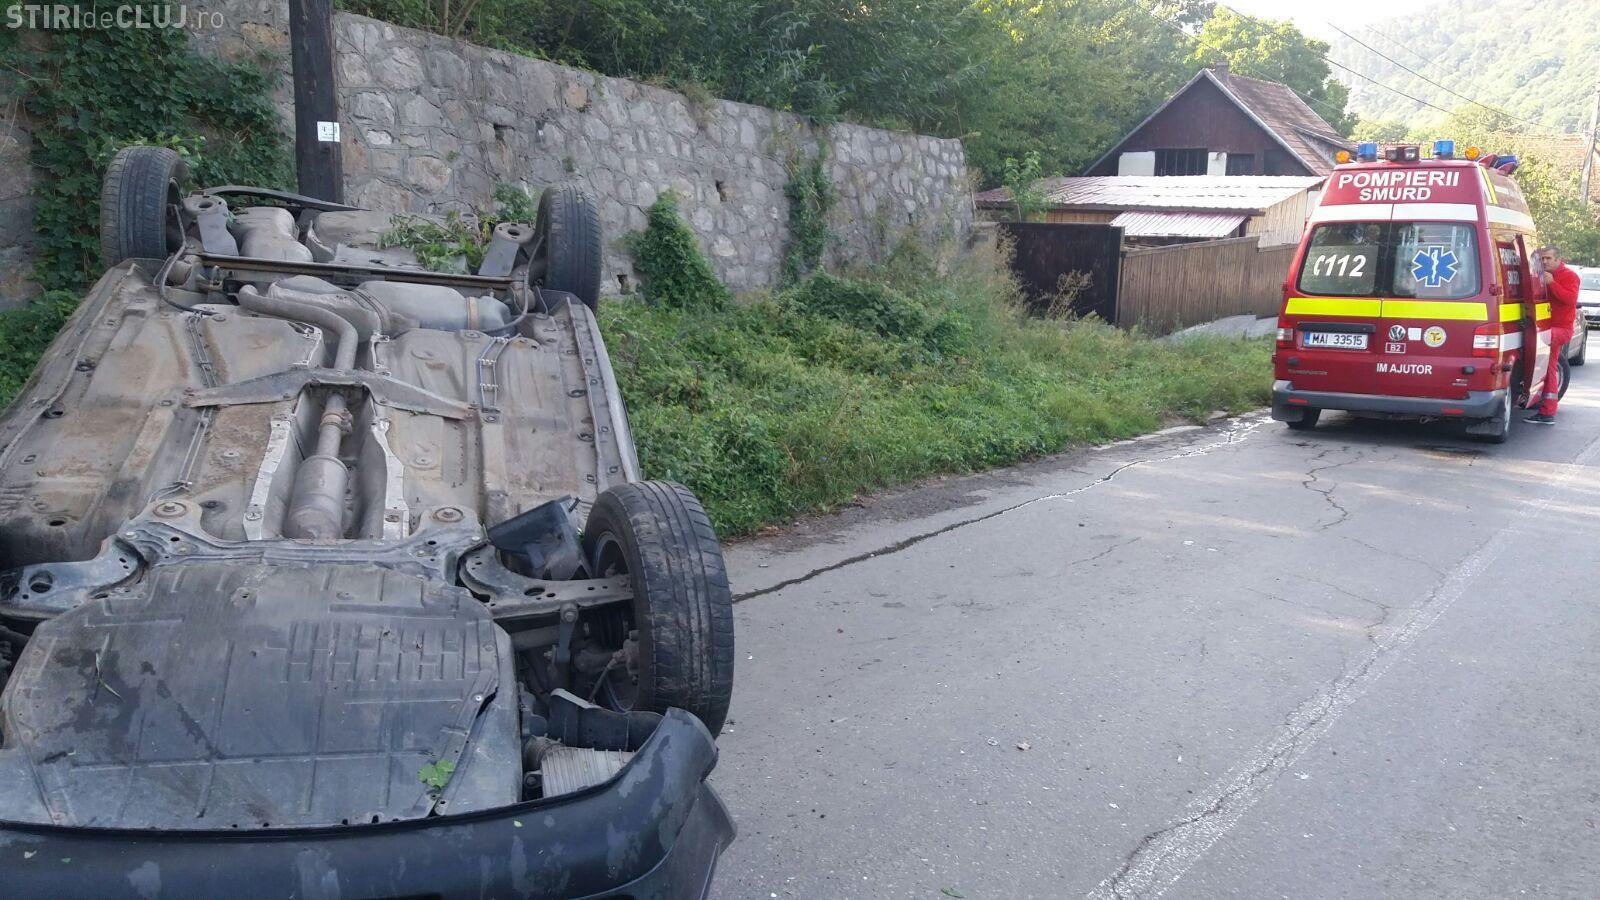 CLUJ: Accident grav la Someșul Rece. Un vitezoman s-a răsturnat cu mașina FOTO